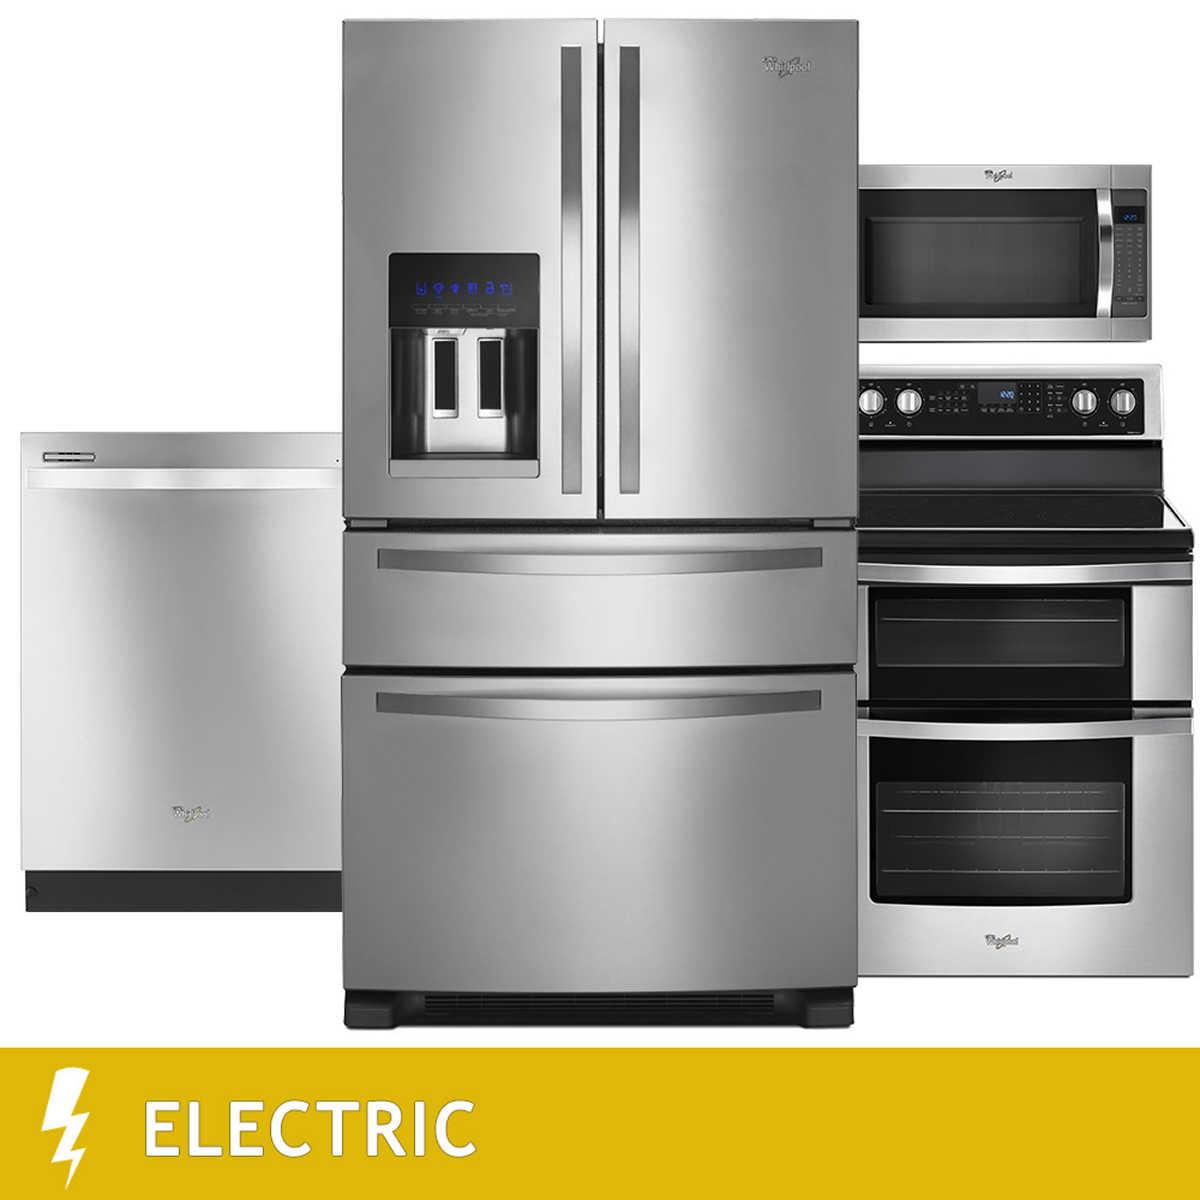 Home Appliance Bundles Kitchen Suites With Electric Range Costco